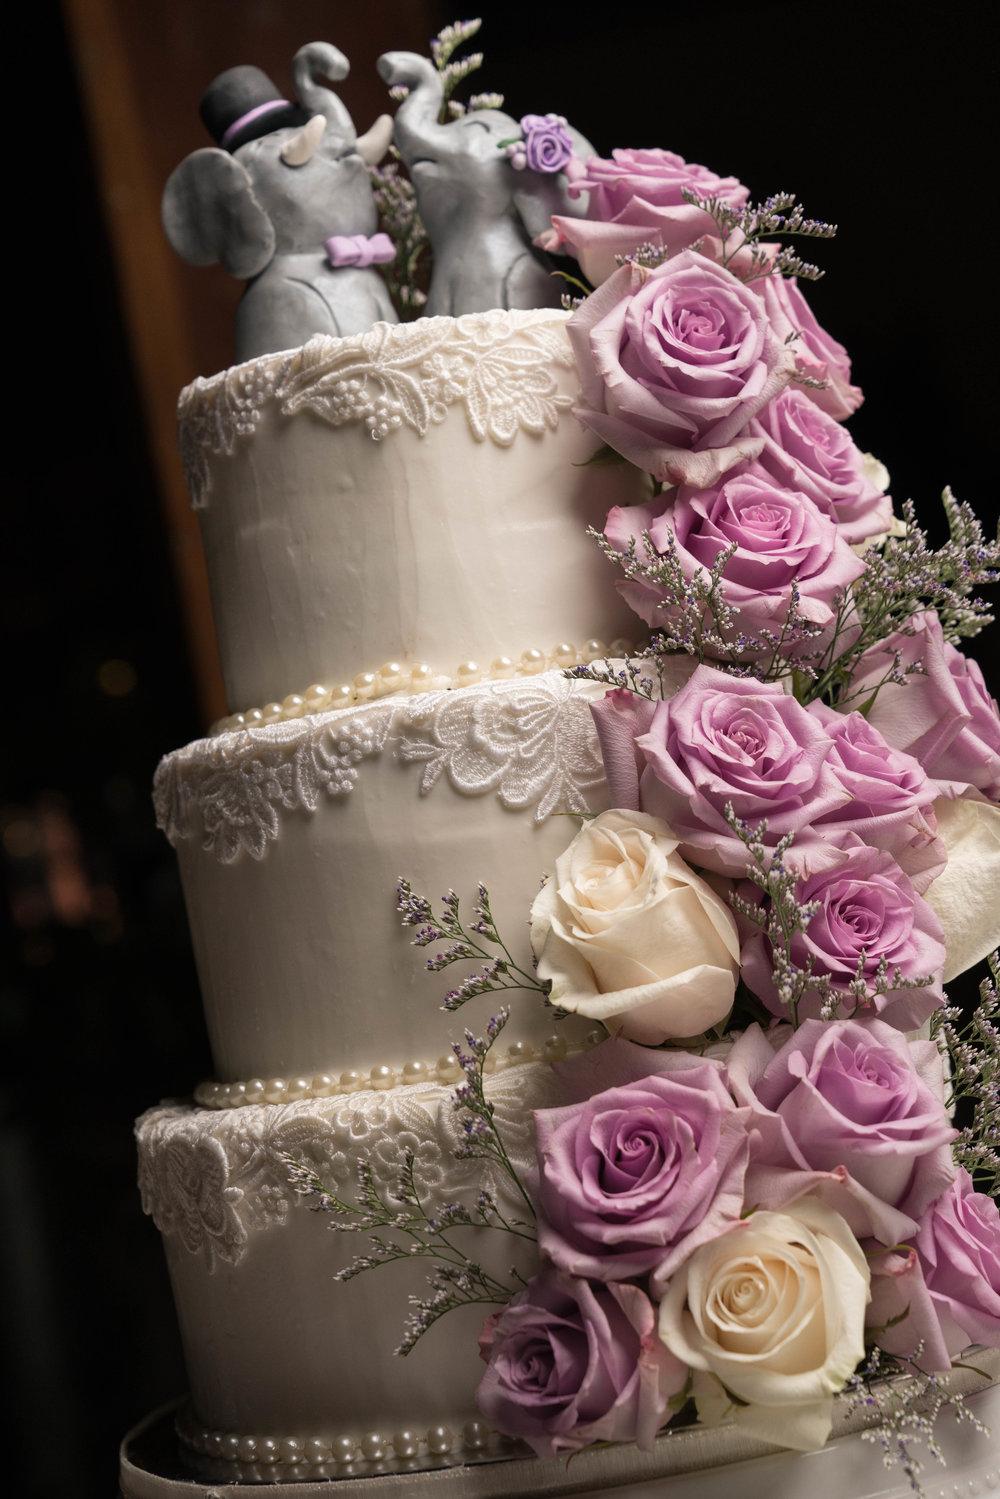 Cake Flowers Small Details-9.jpg